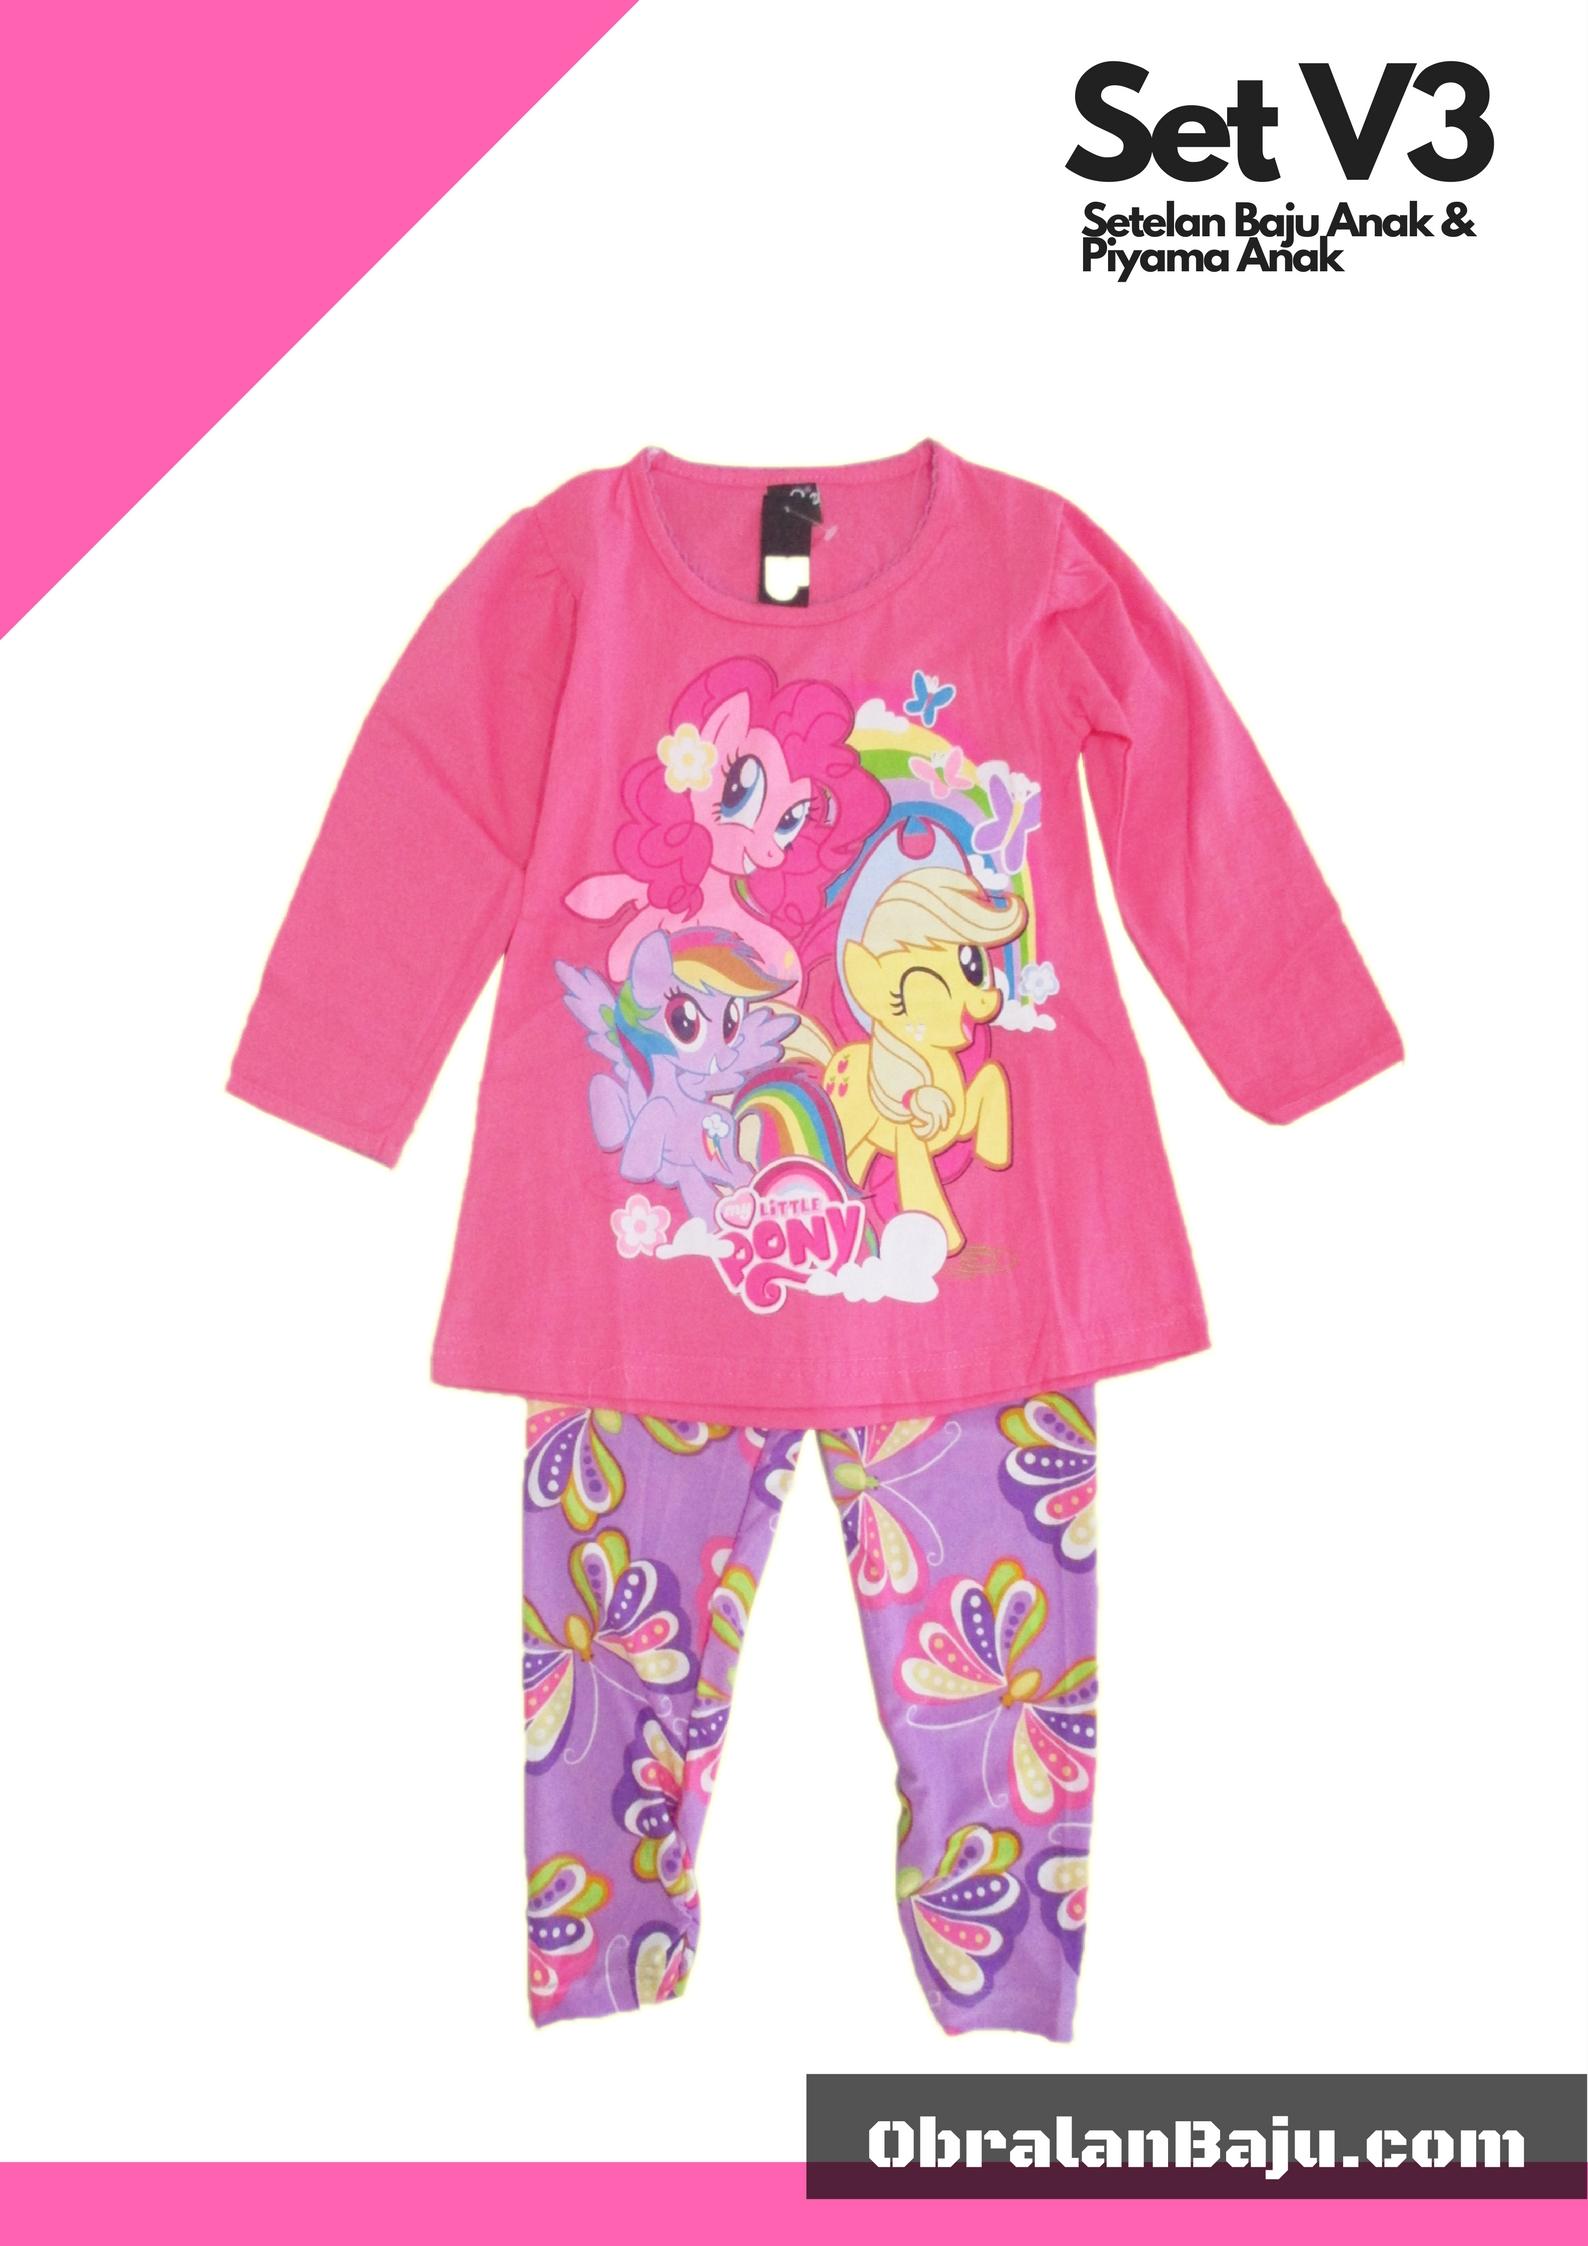 sentra grosiran baju tidur anak